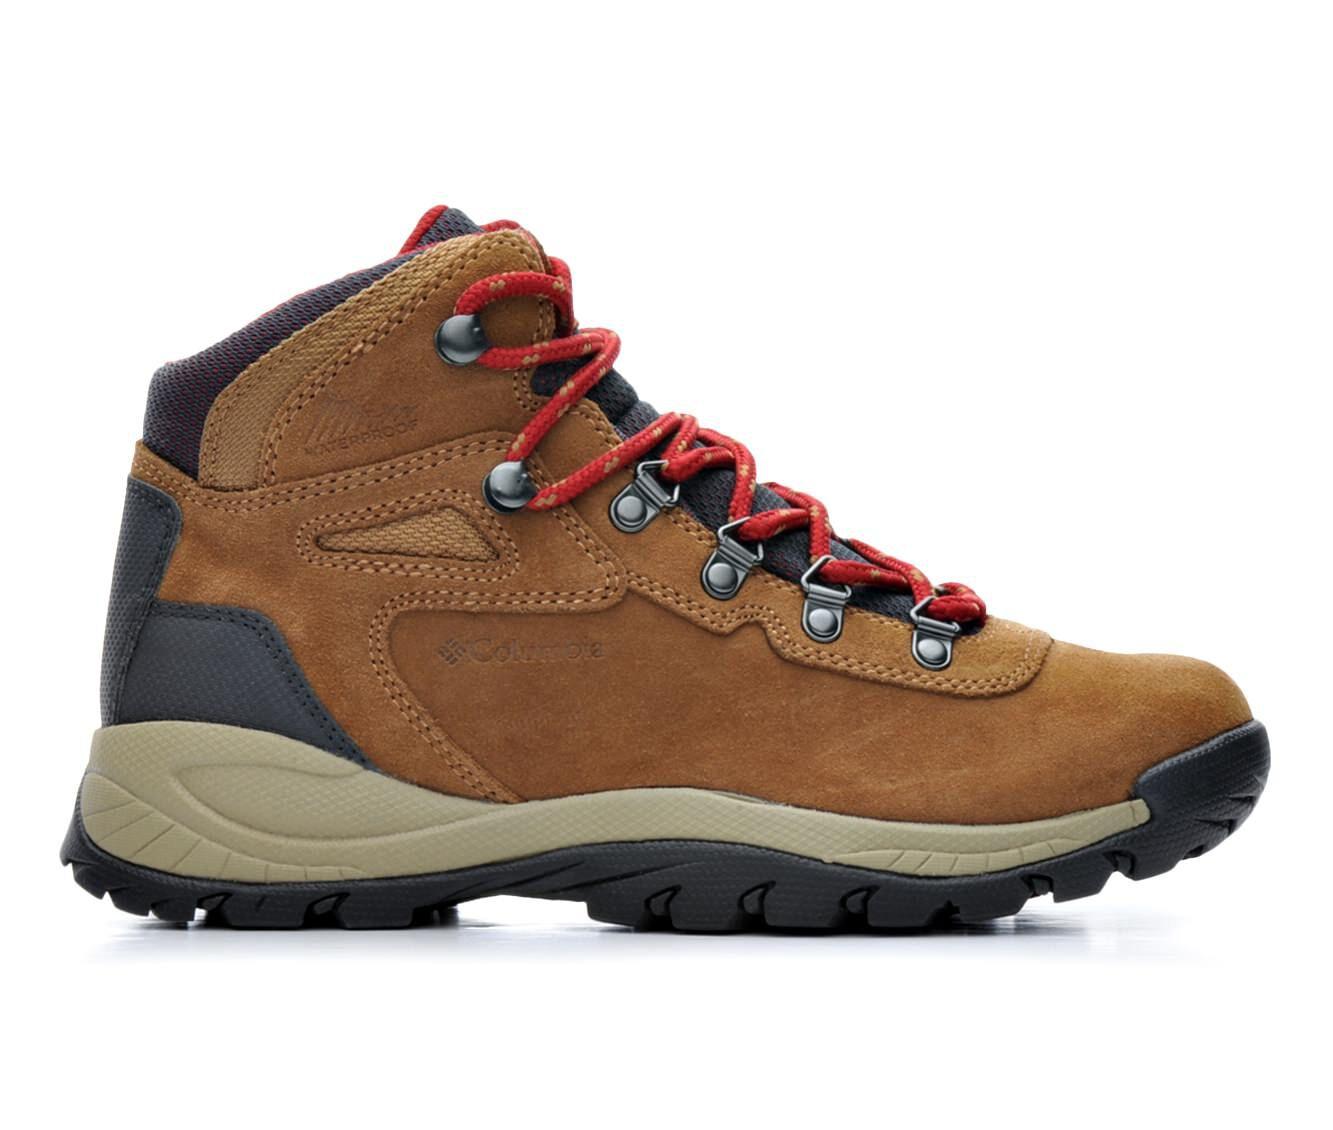 Women's Columbia Newton Ridge Plus WP Amped Hiking Boots Elk/Red